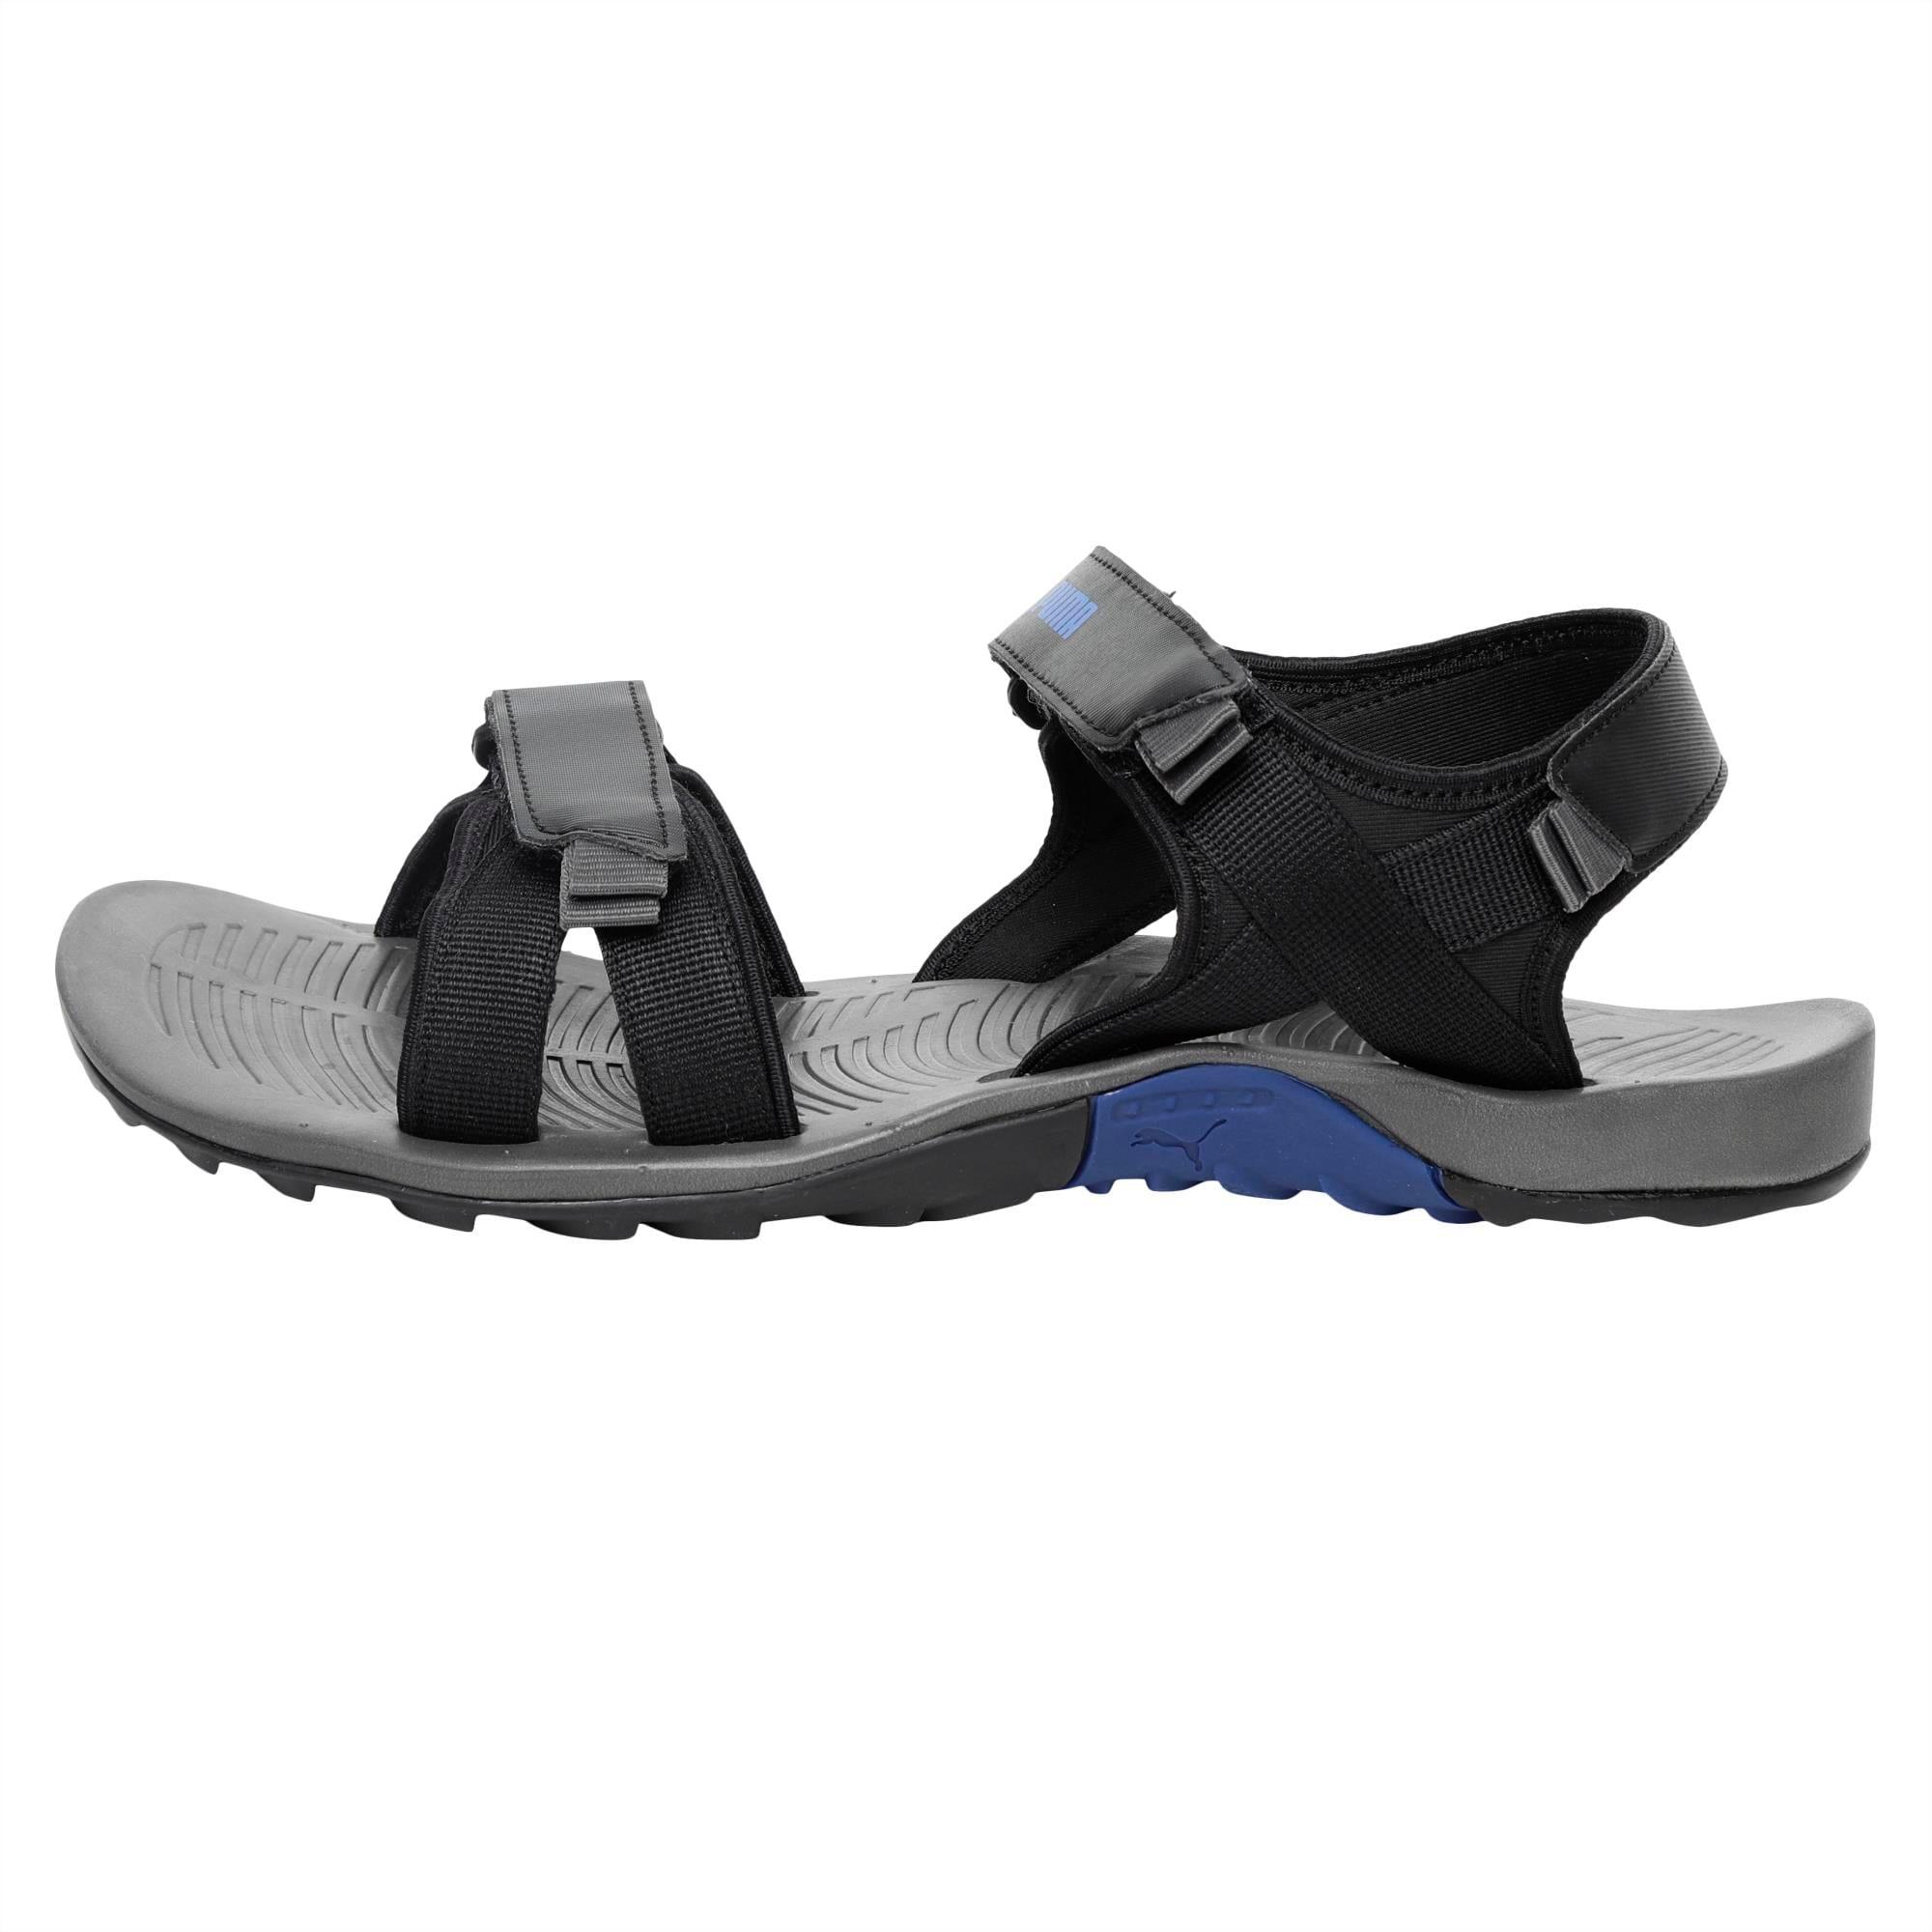 Escarchado Terrible Rápido  Force IDP Men's Sandals | Dark Shadow-Puma Black | PUMA Shoes | PUMA